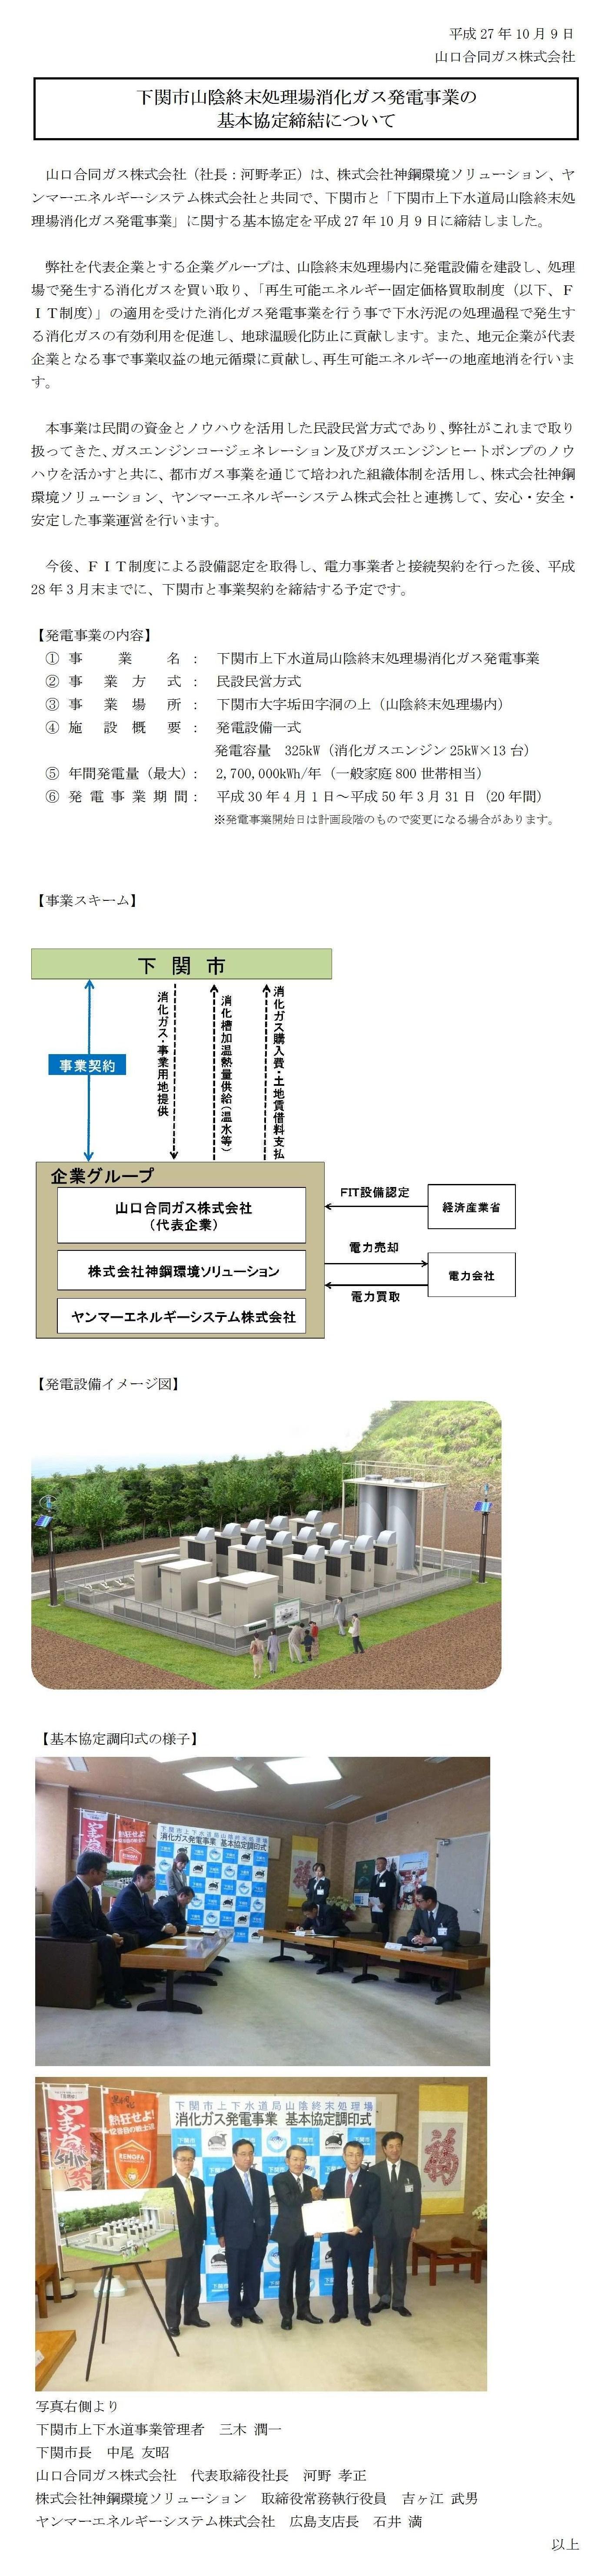 下関市山陰終末処理場消化ガス発電事業の基本協定